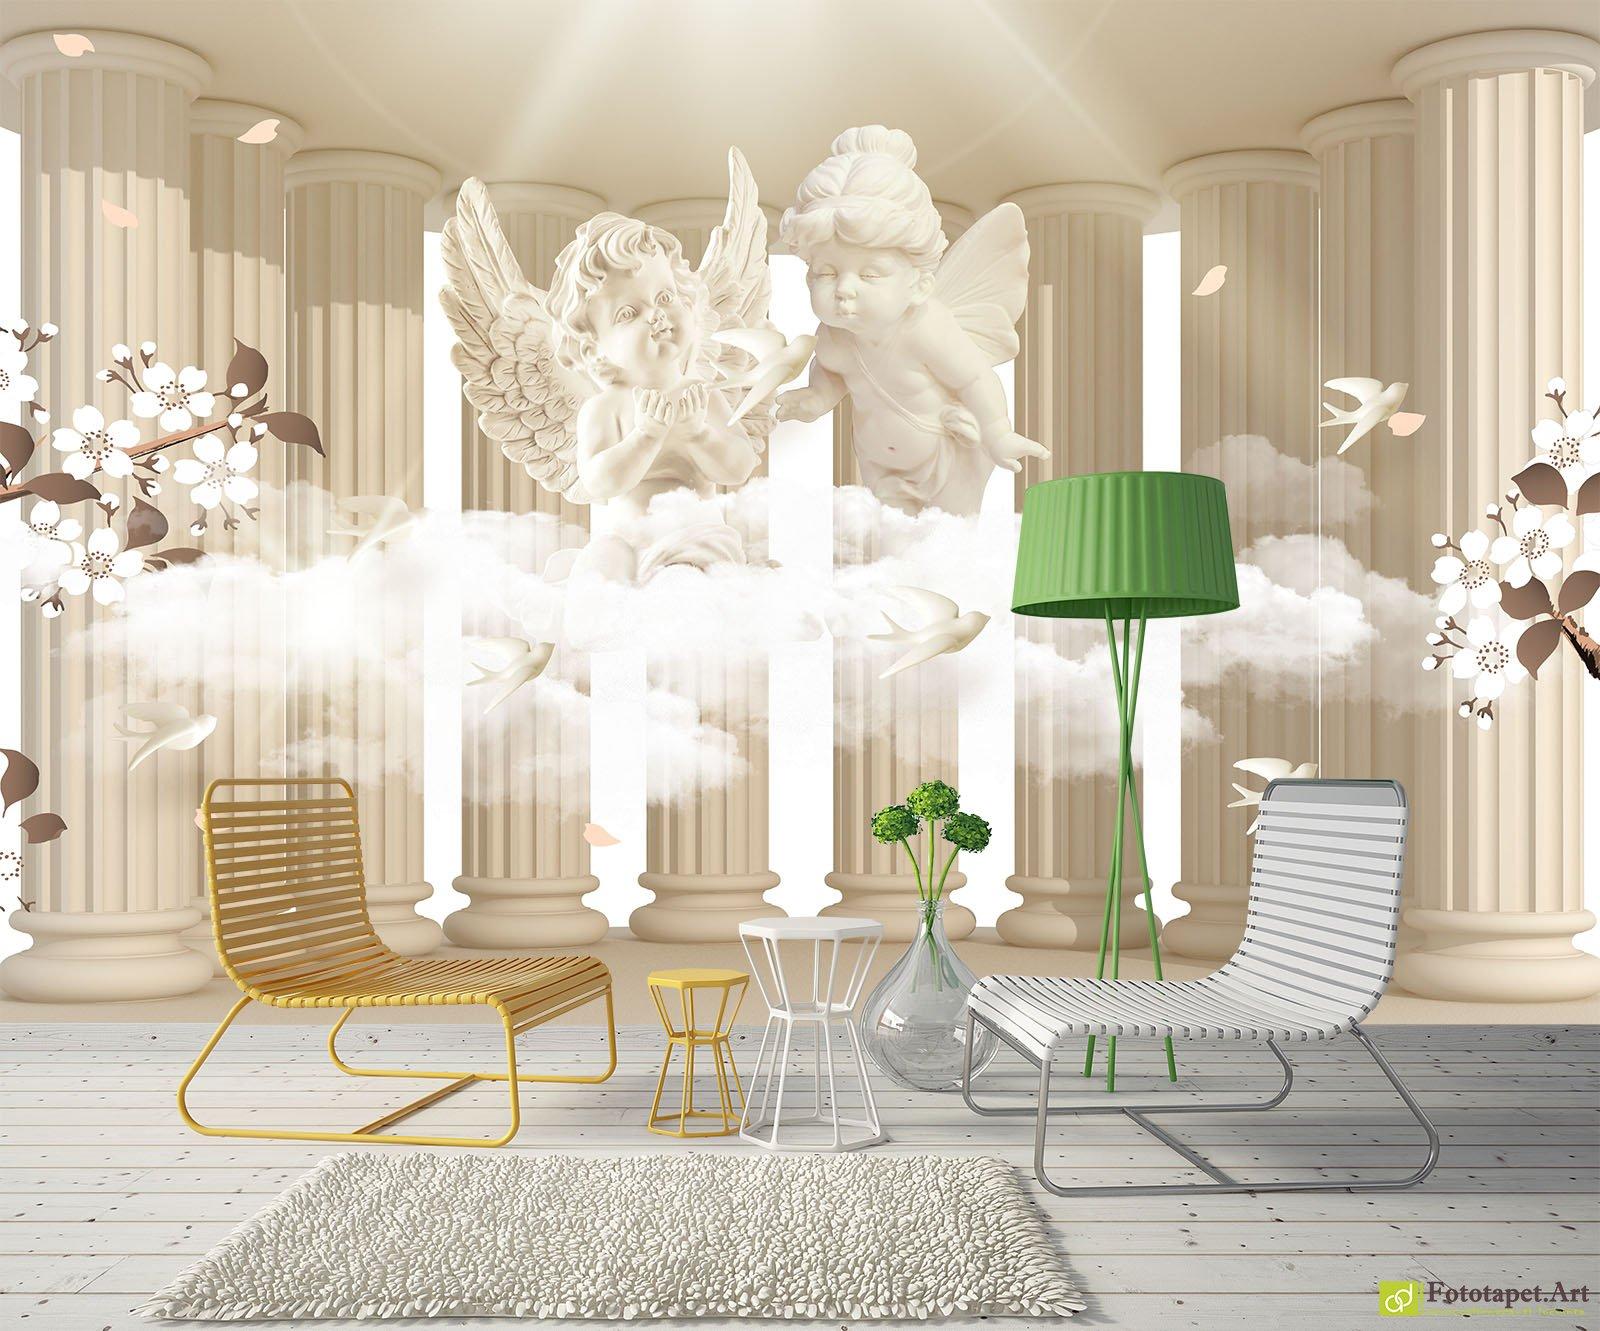 Photo Wallpaper 3D Effect - Columns and angels | Fototapet.art ...